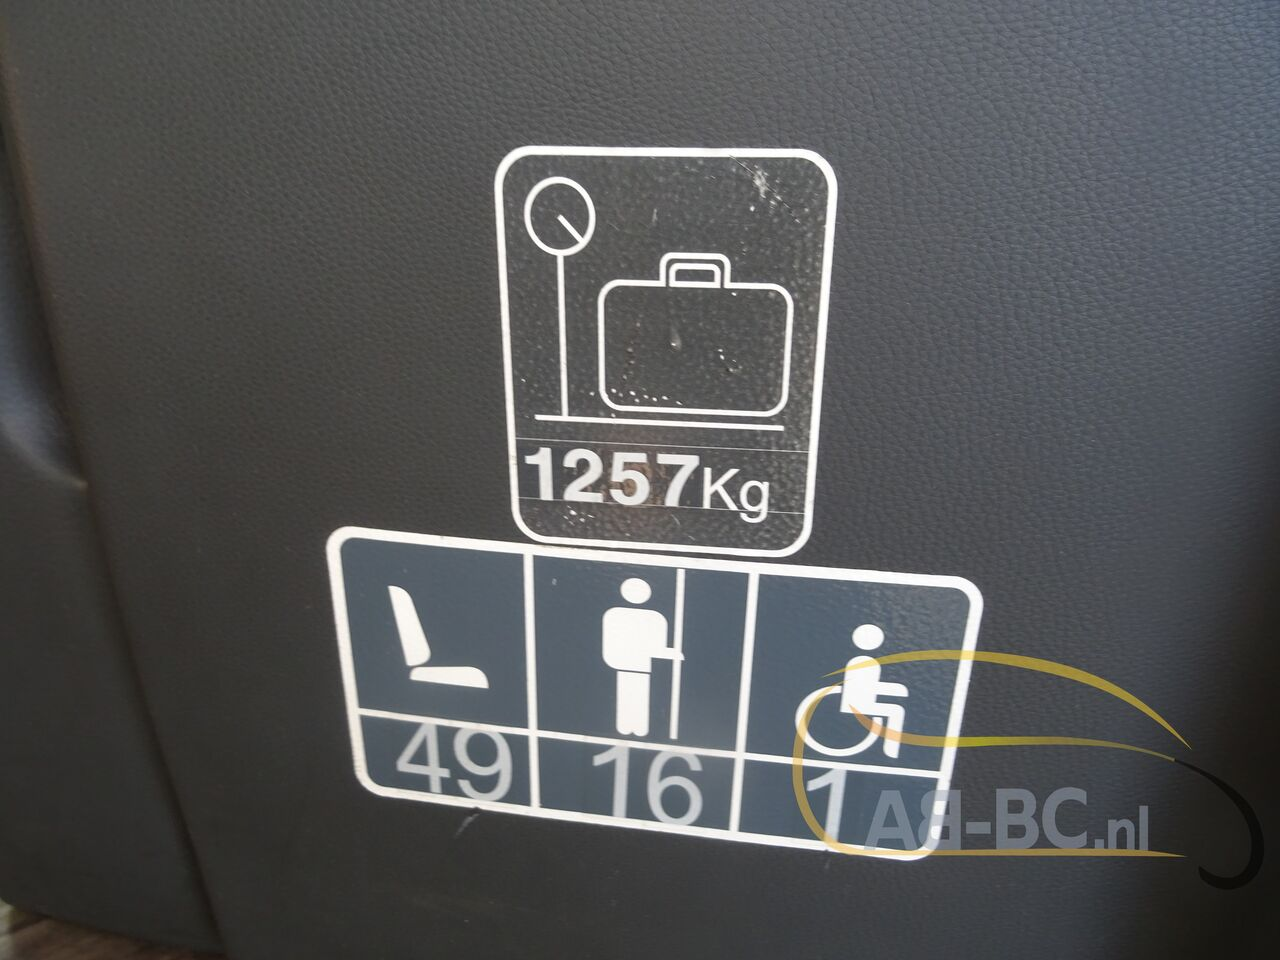 coach-bus-SETRA-S415H-52-Seats-EURO-6-Liftbus---1630913245752902826_big_9ce6c35dcf9886be1458121073ee3a20--21070517141280735500